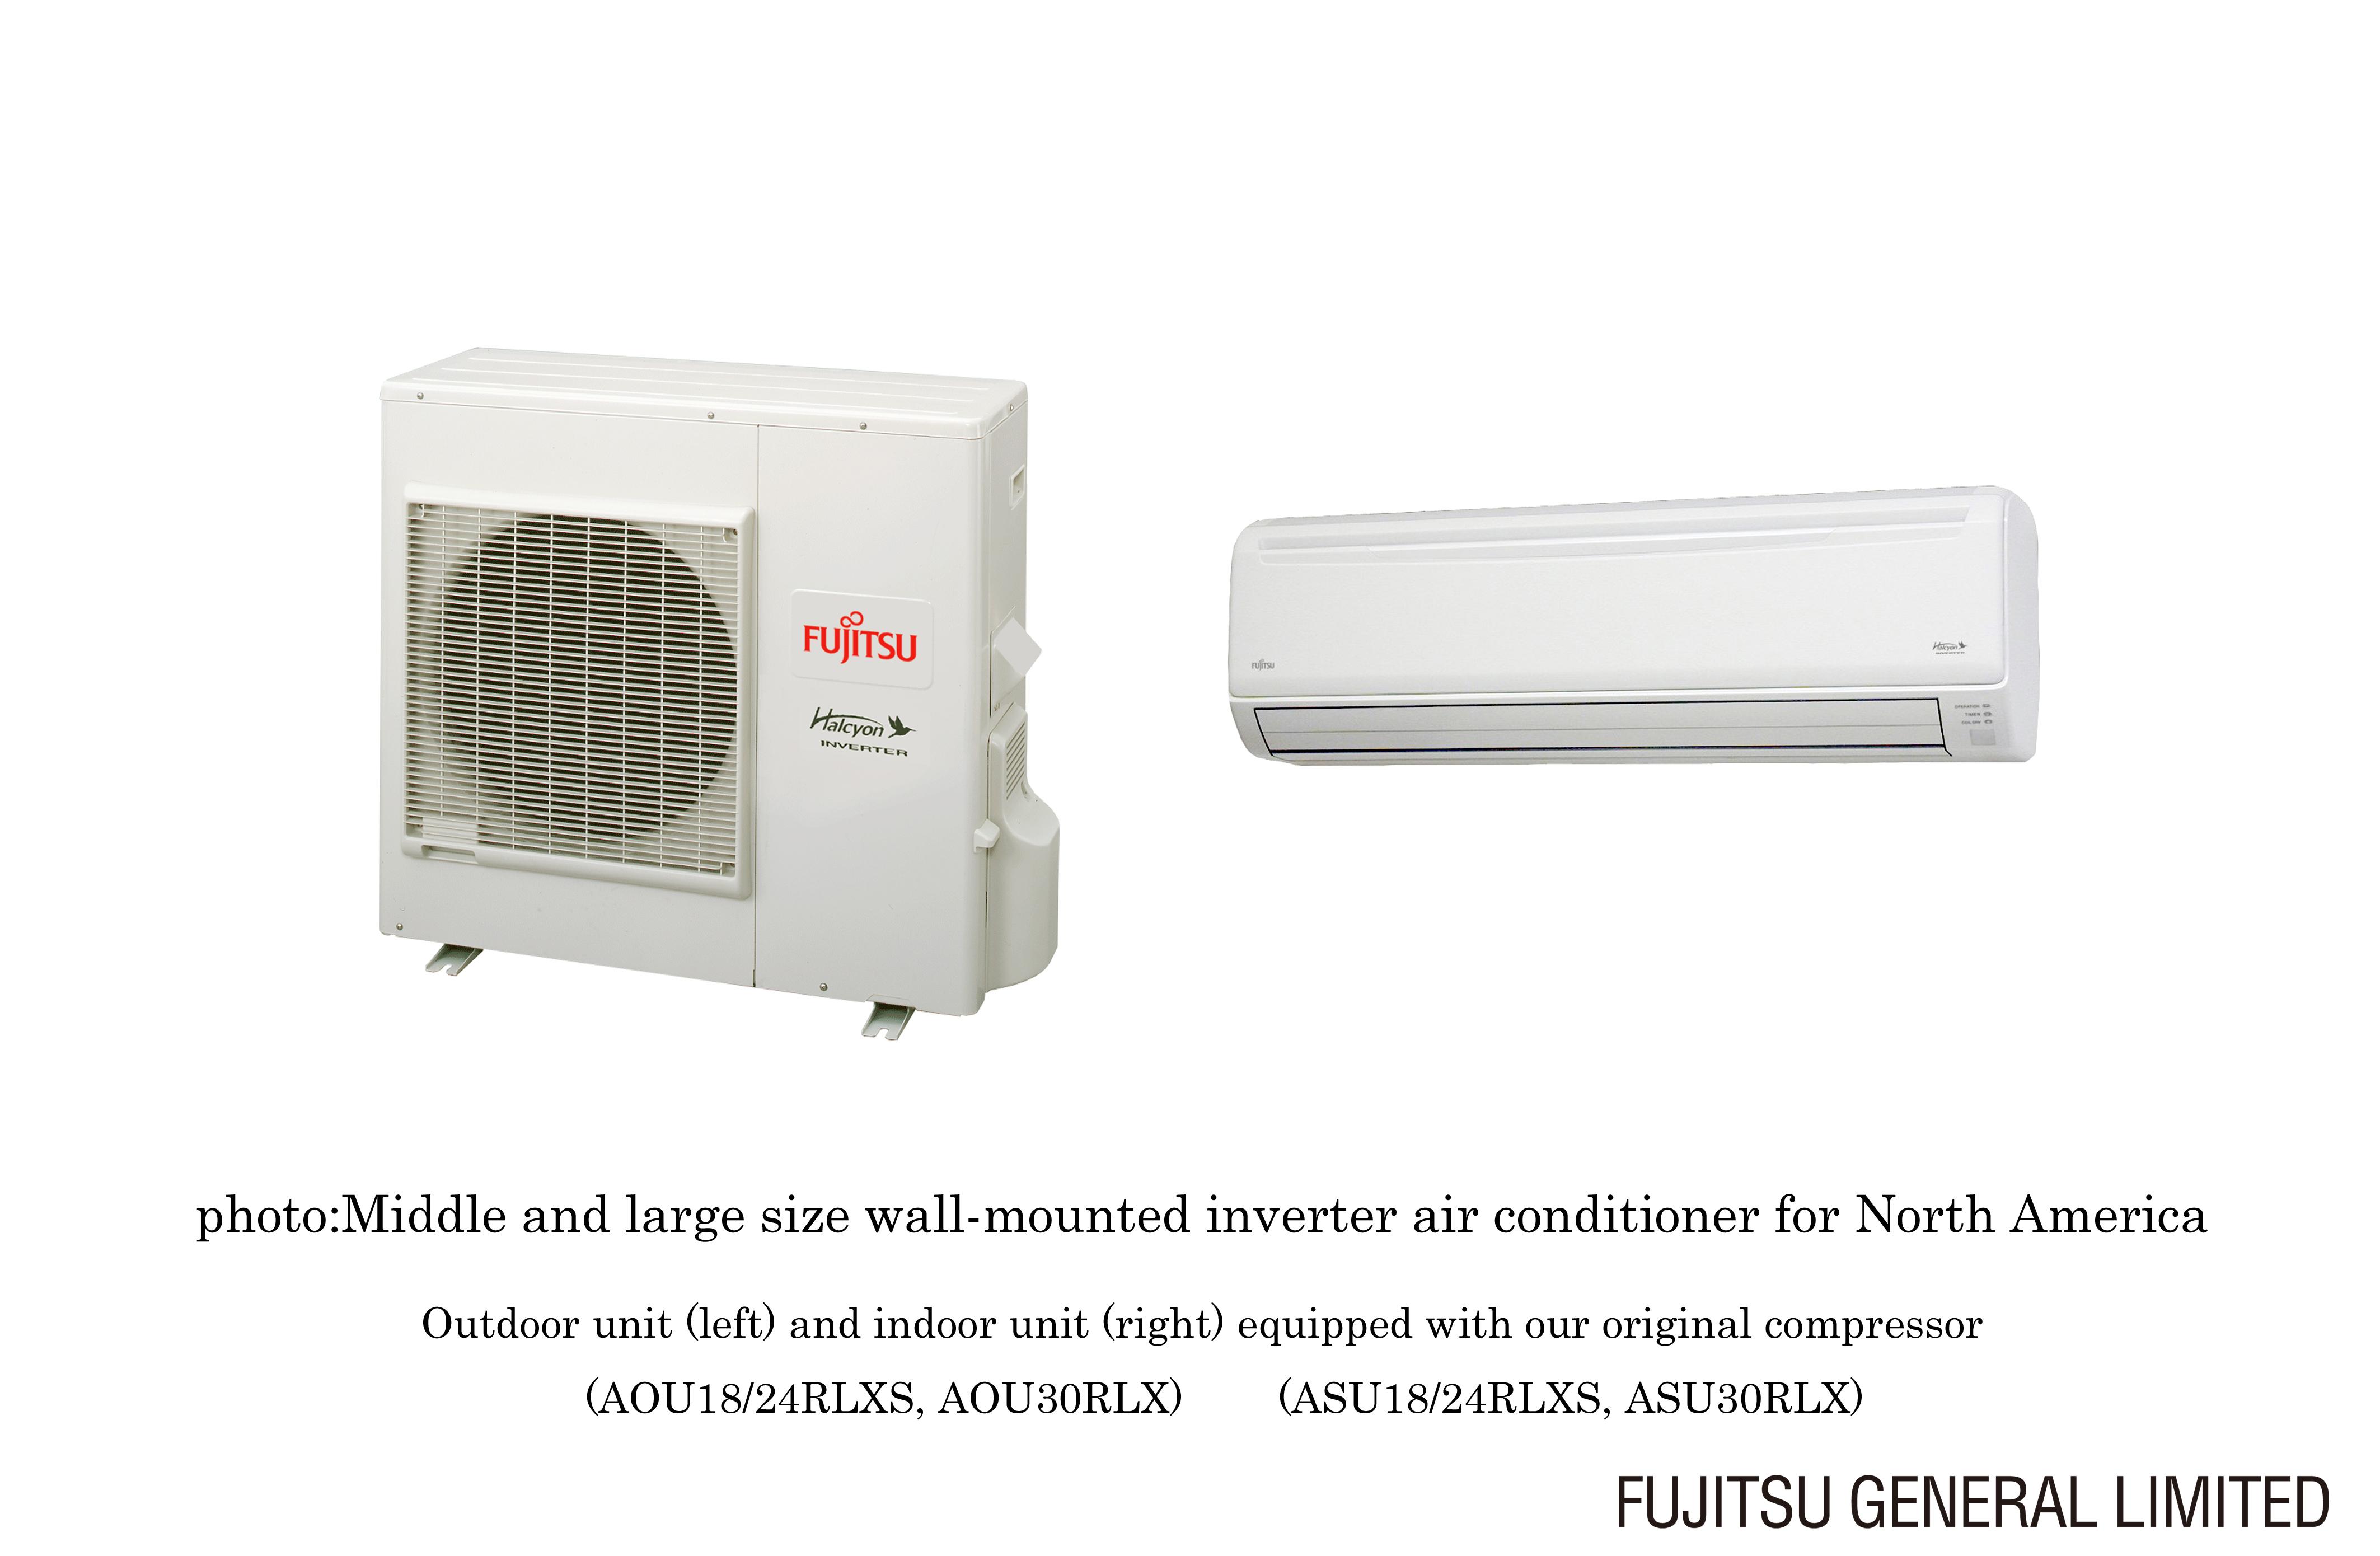 by enhanced lineup of energy saving air conditioners FUJITSU GENERAL #B42017